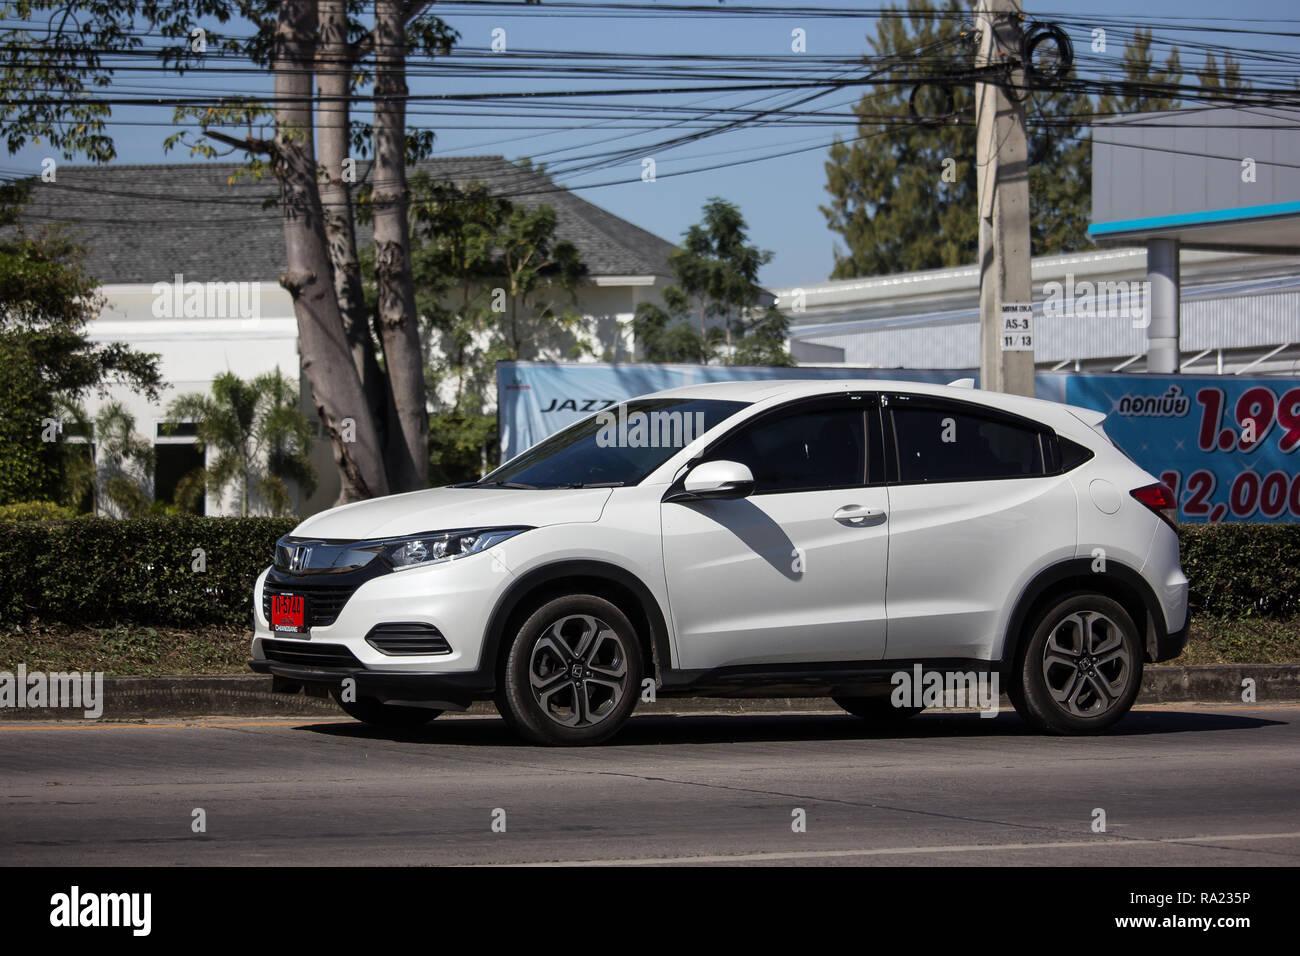 New Honda Suv >> Chiangmai Thailand December 24 2018 Private Car New